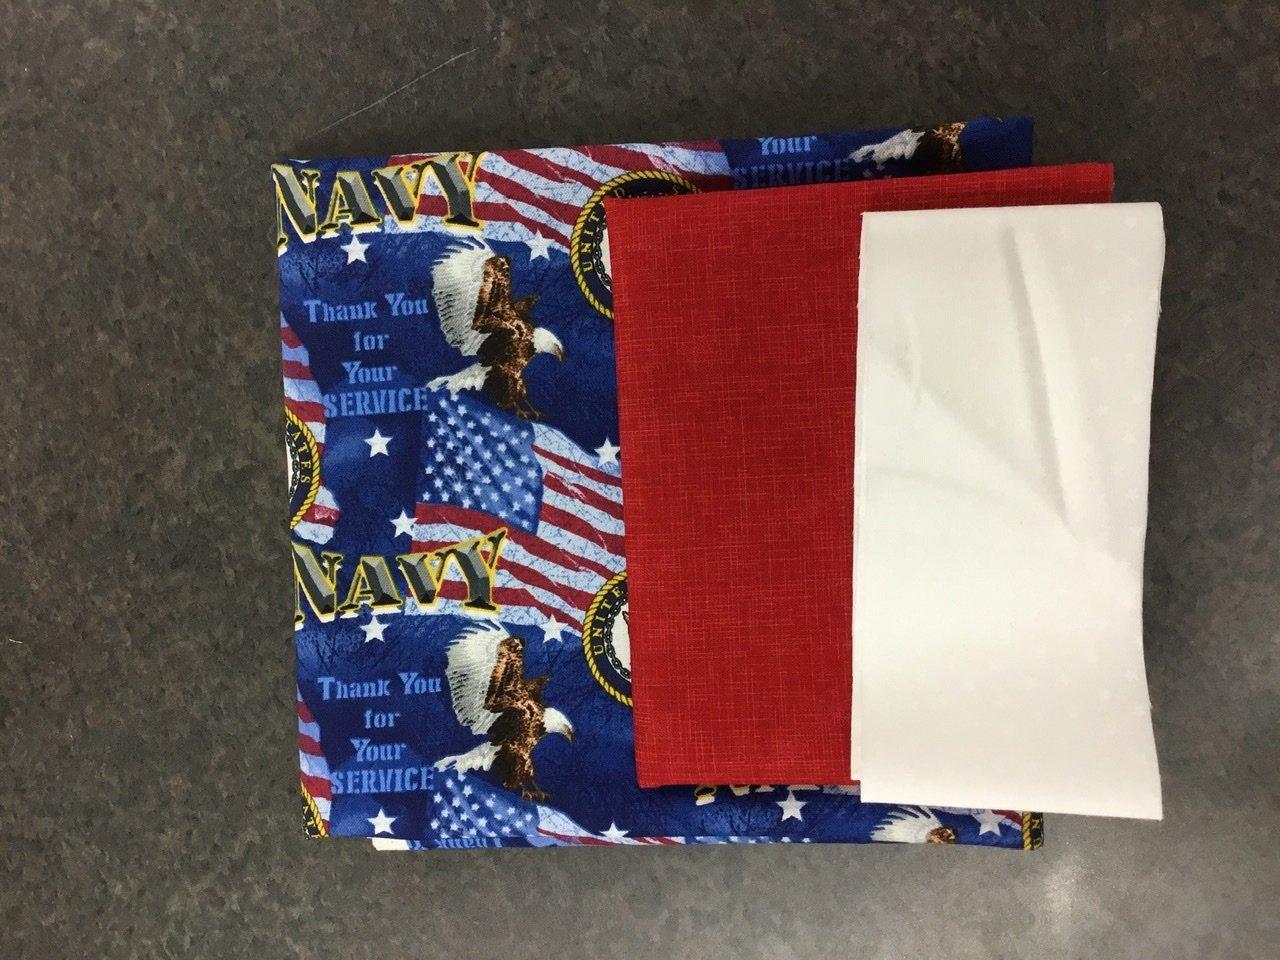 Navy pillow case kit